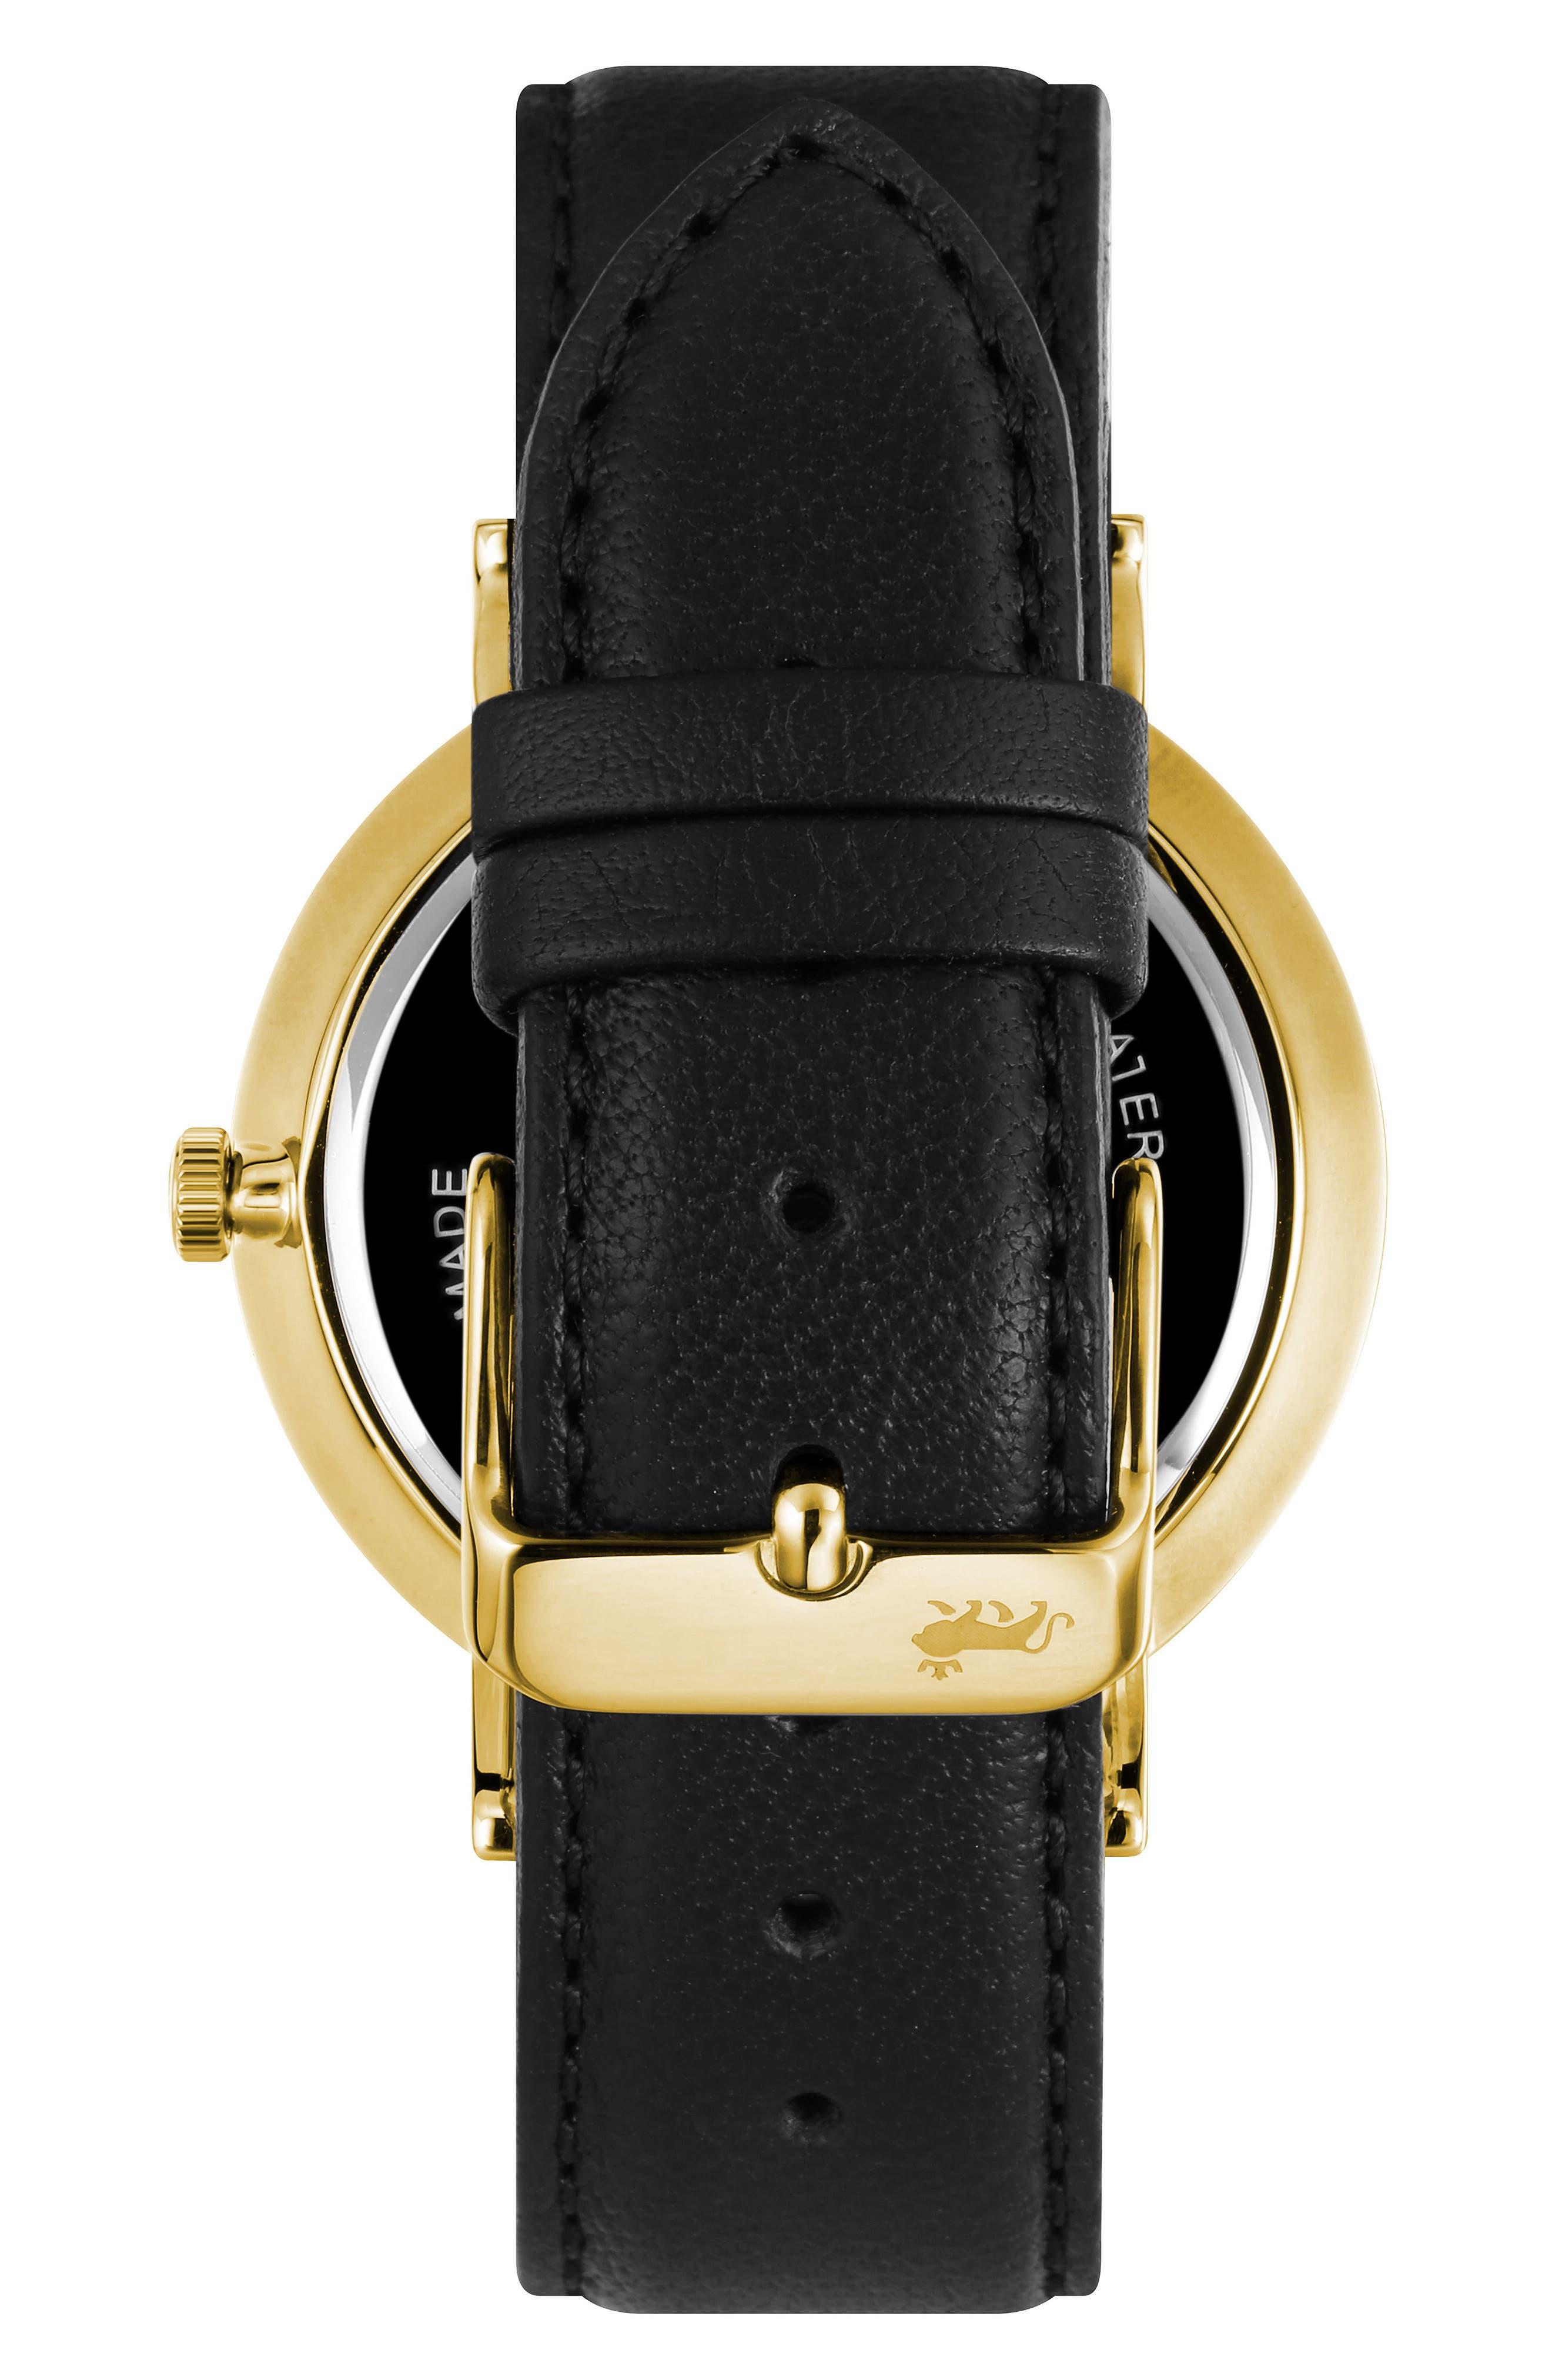 LARSSON & JENNINGS, Lugano Leather Strap Watch, 38mm, Alternate thumbnail 2, color, 001